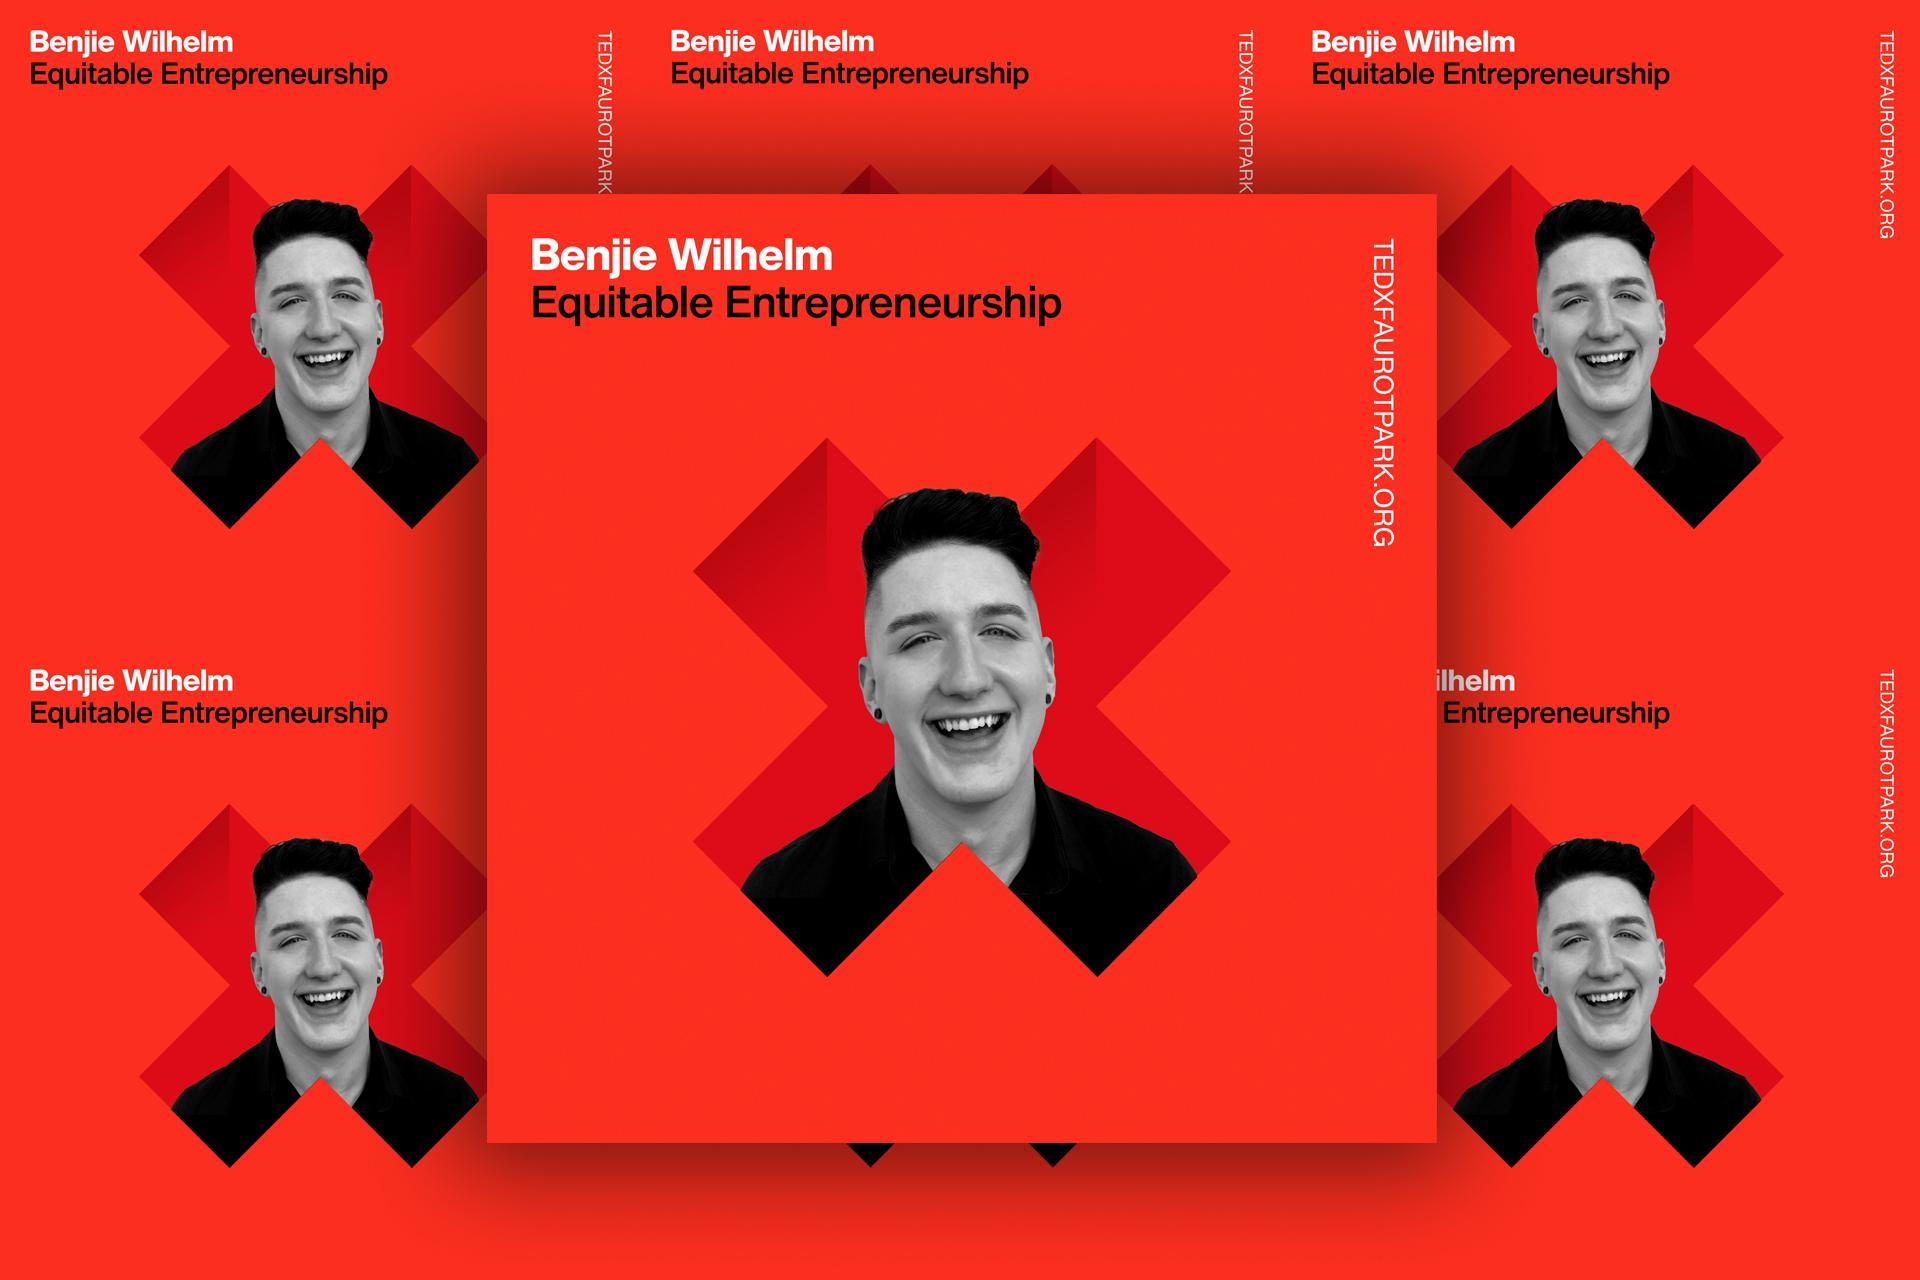 Benjie Wilhelm ('17) to present as a TedxFaurotPark Speaker on Equitable Entrepreneurship in October.